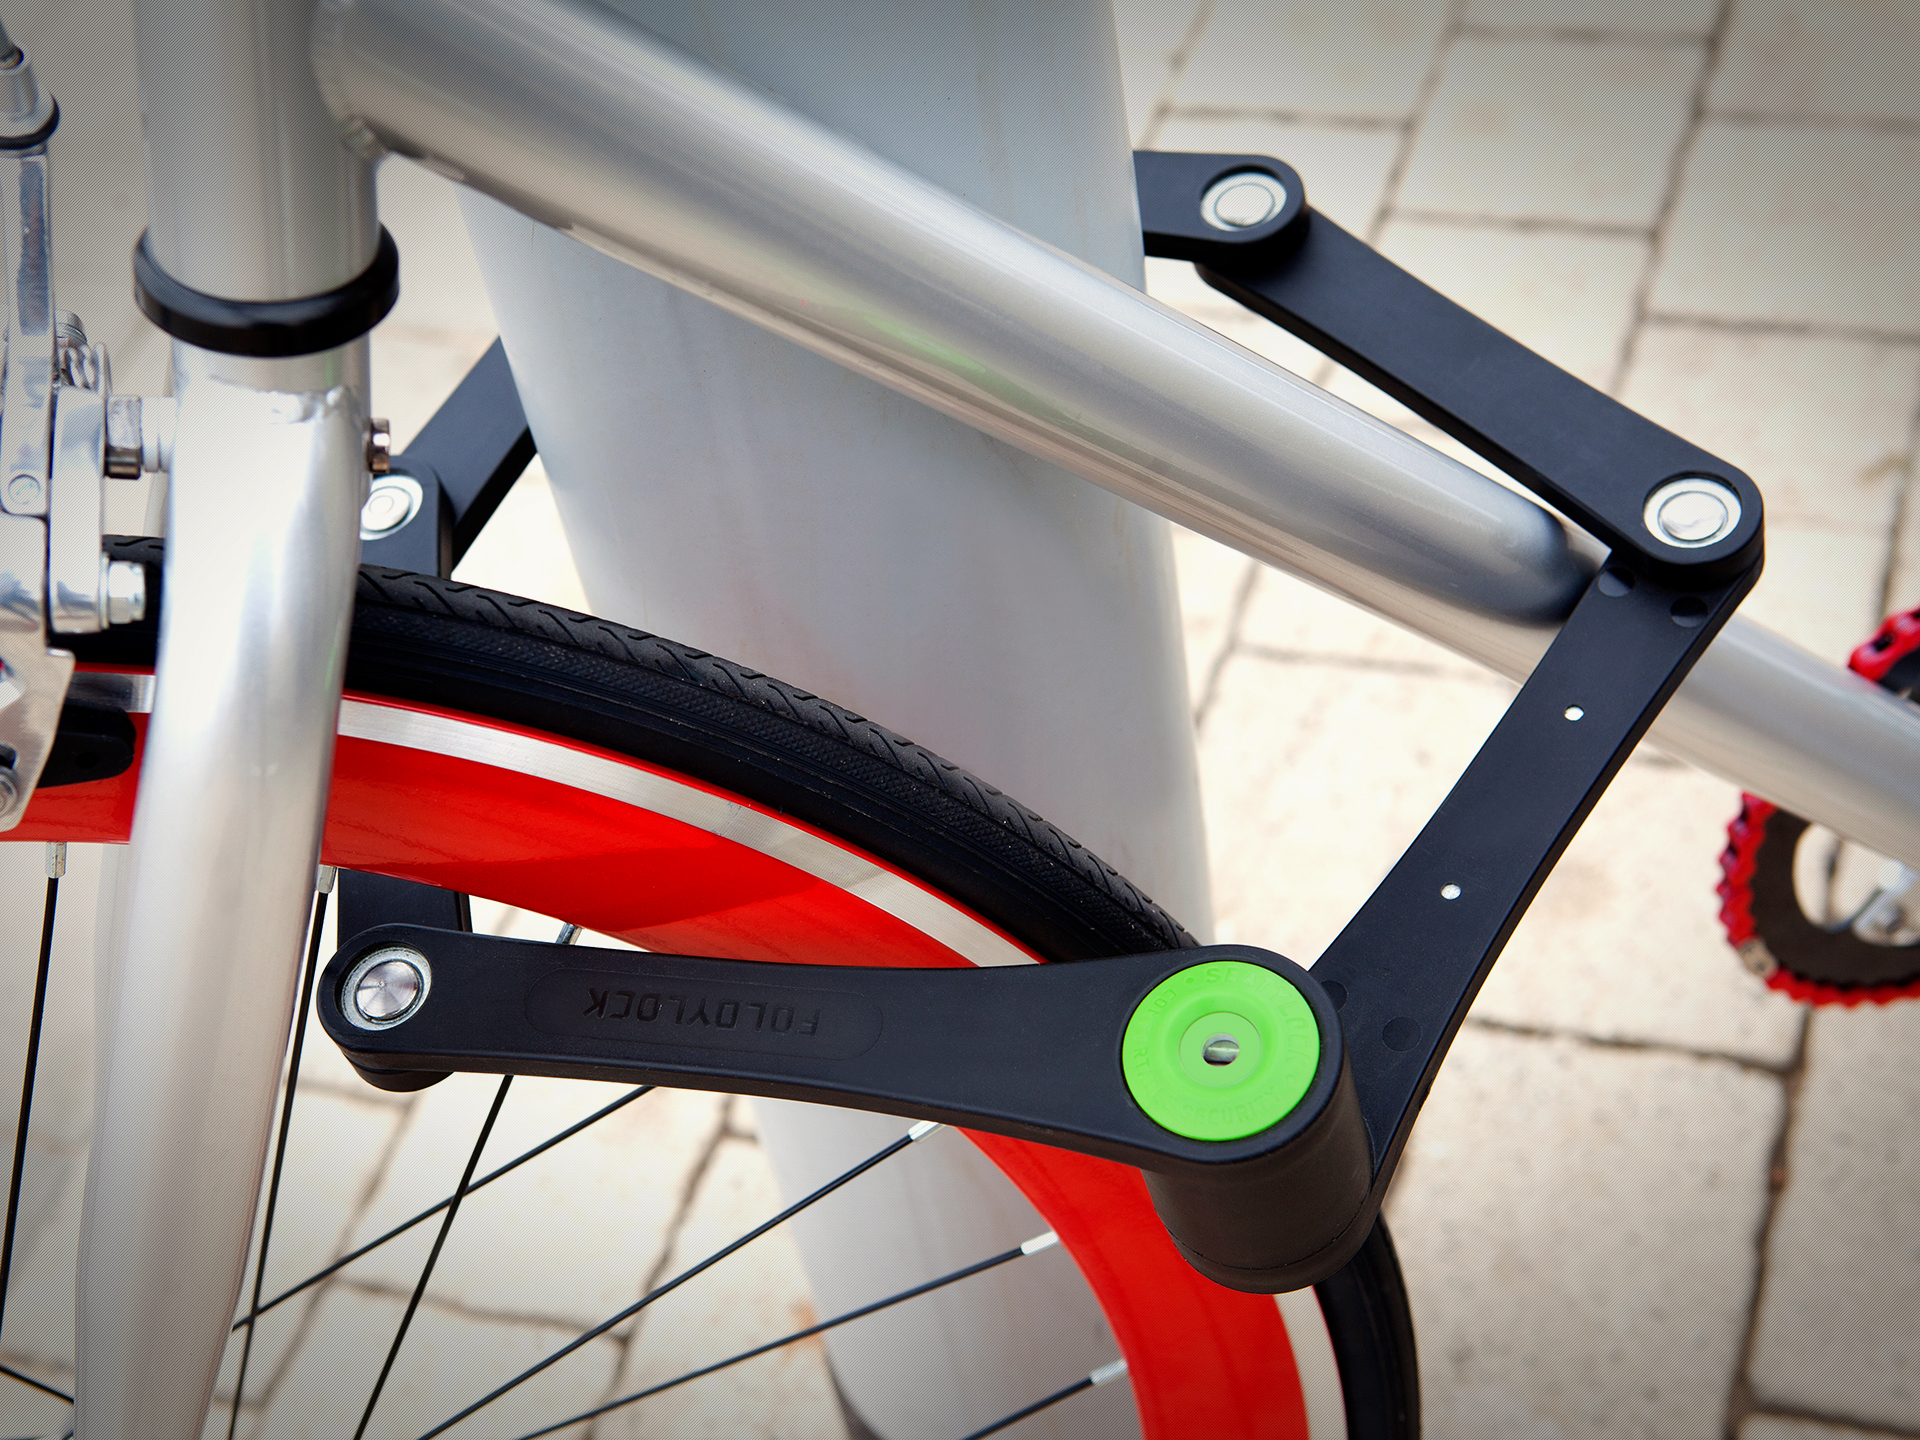 foldylock bike lock go ahead ruin a thief 39 s day urbasm. Black Bedroom Furniture Sets. Home Design Ideas